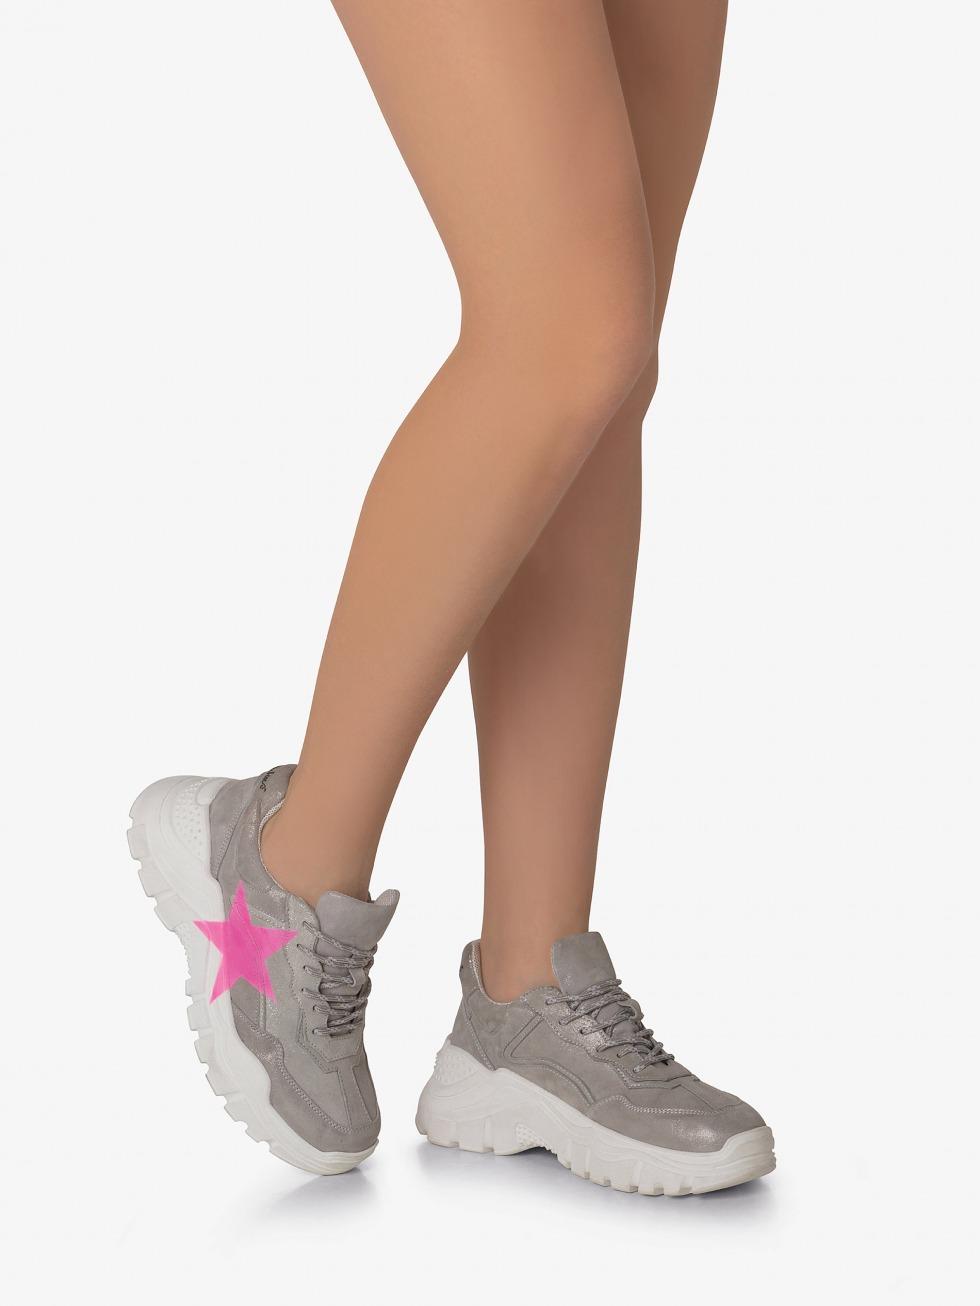 Aviations Chunky Sneakers - Stardust Neon Fuchsia Star